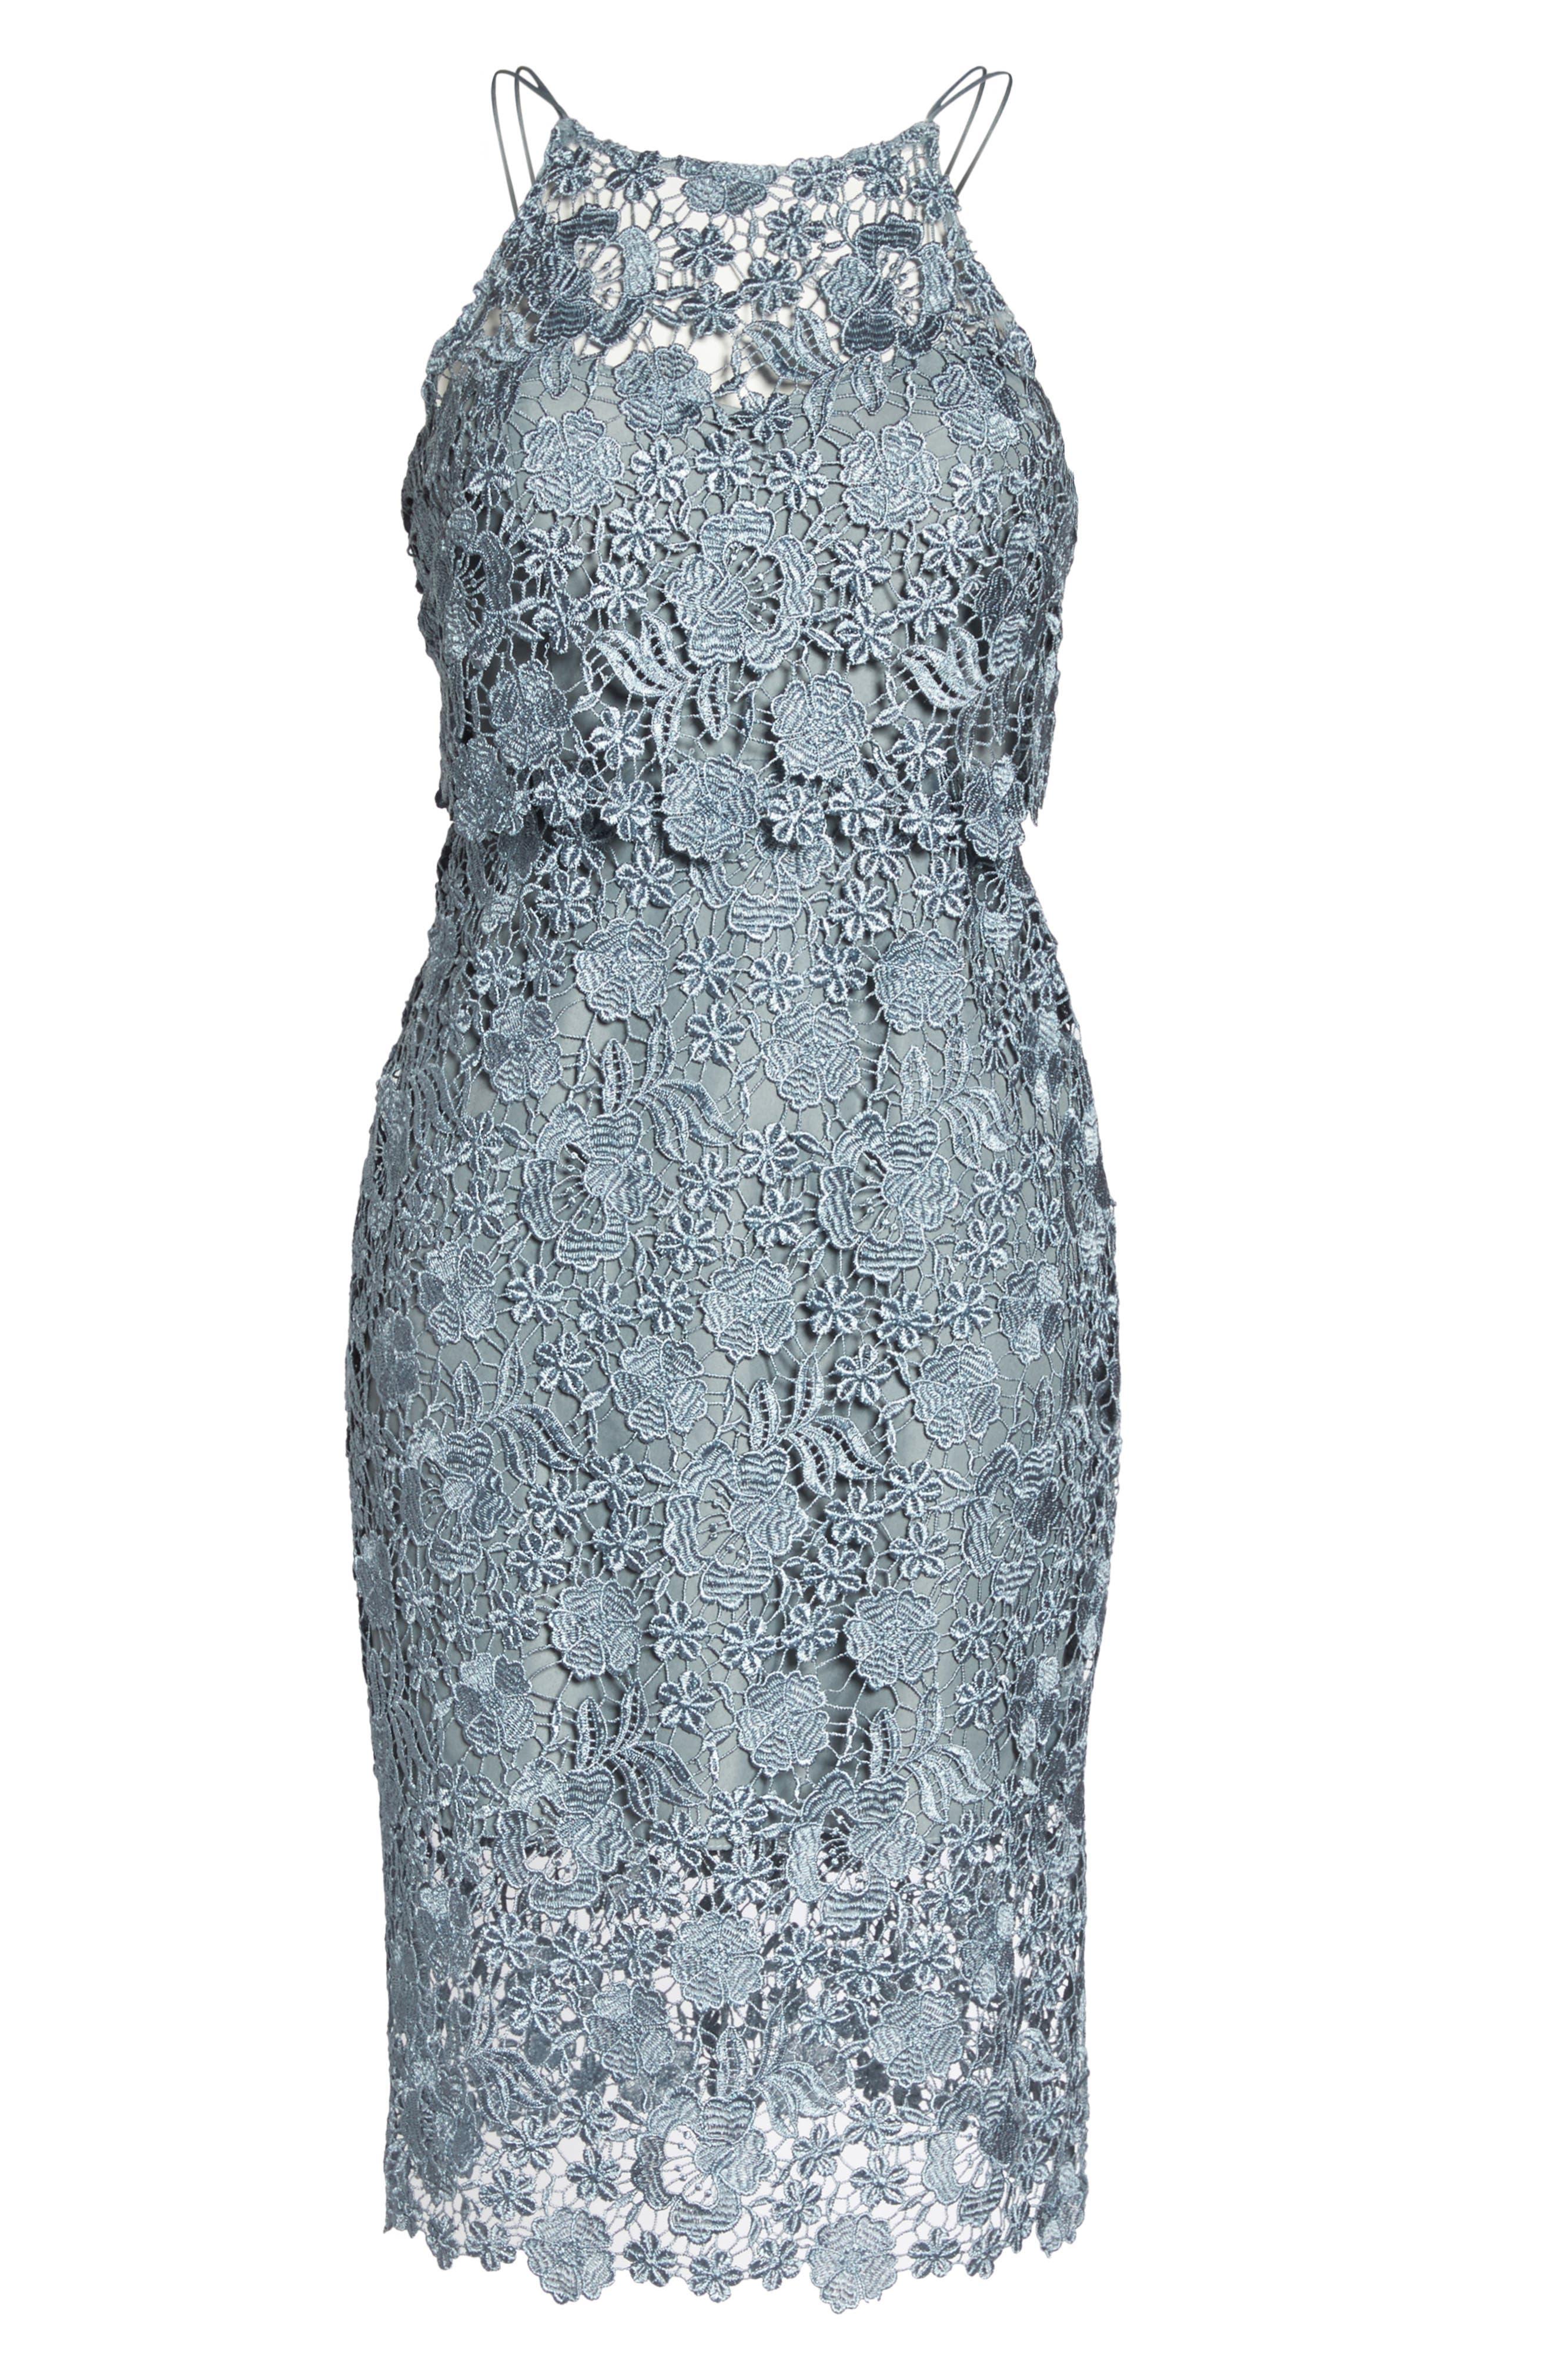 Freya Lace Sheath Dress,                             Alternate thumbnail 6, color,                             MAYAN BLUE